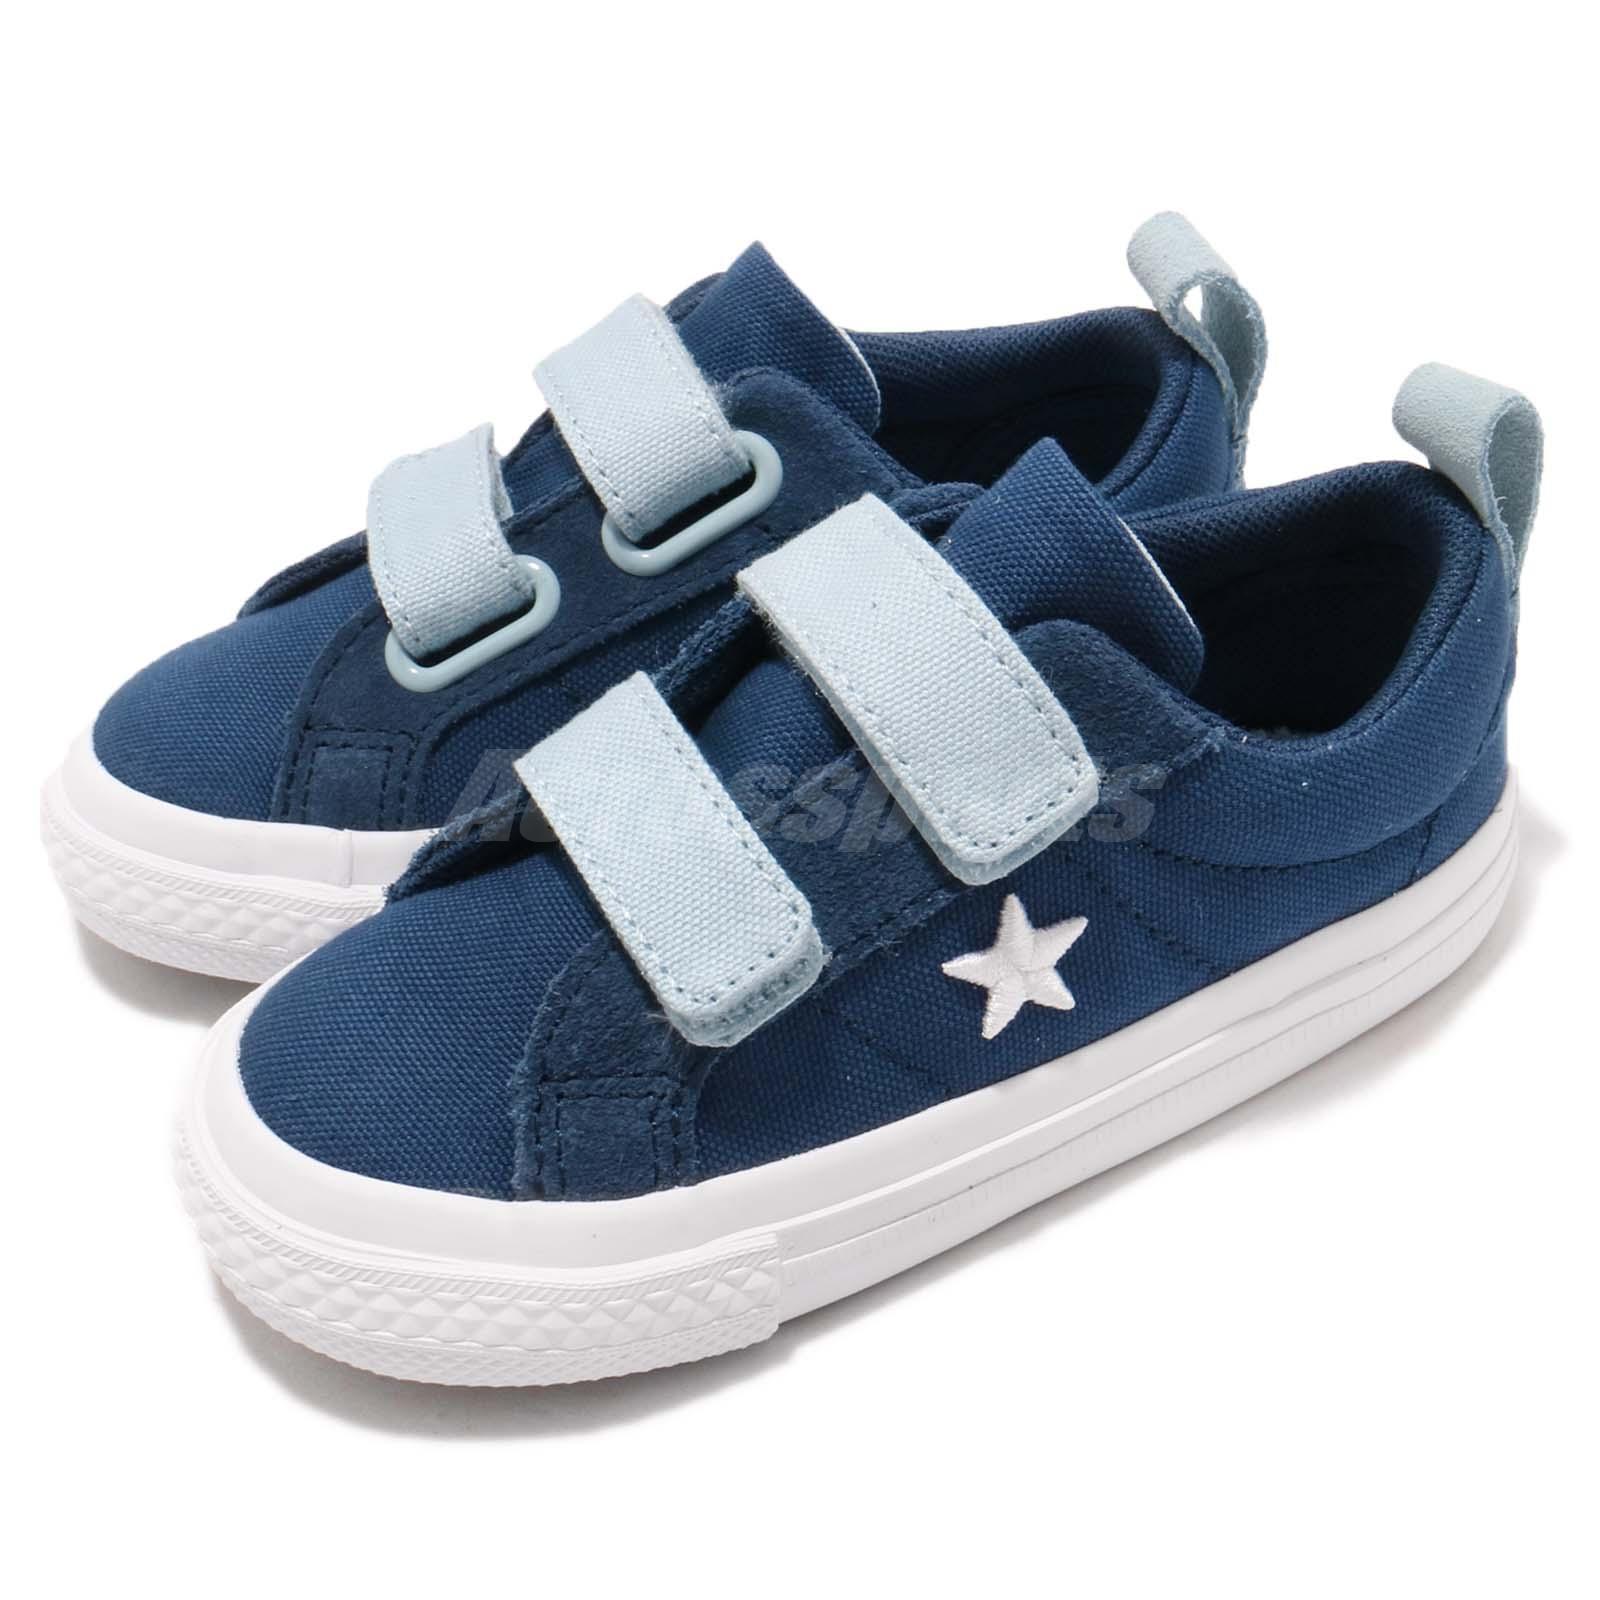 95e558f4b5ba Details about Converse One Star 2V Canvas Straps Blue White Infant Toddler  Shoes 760763C